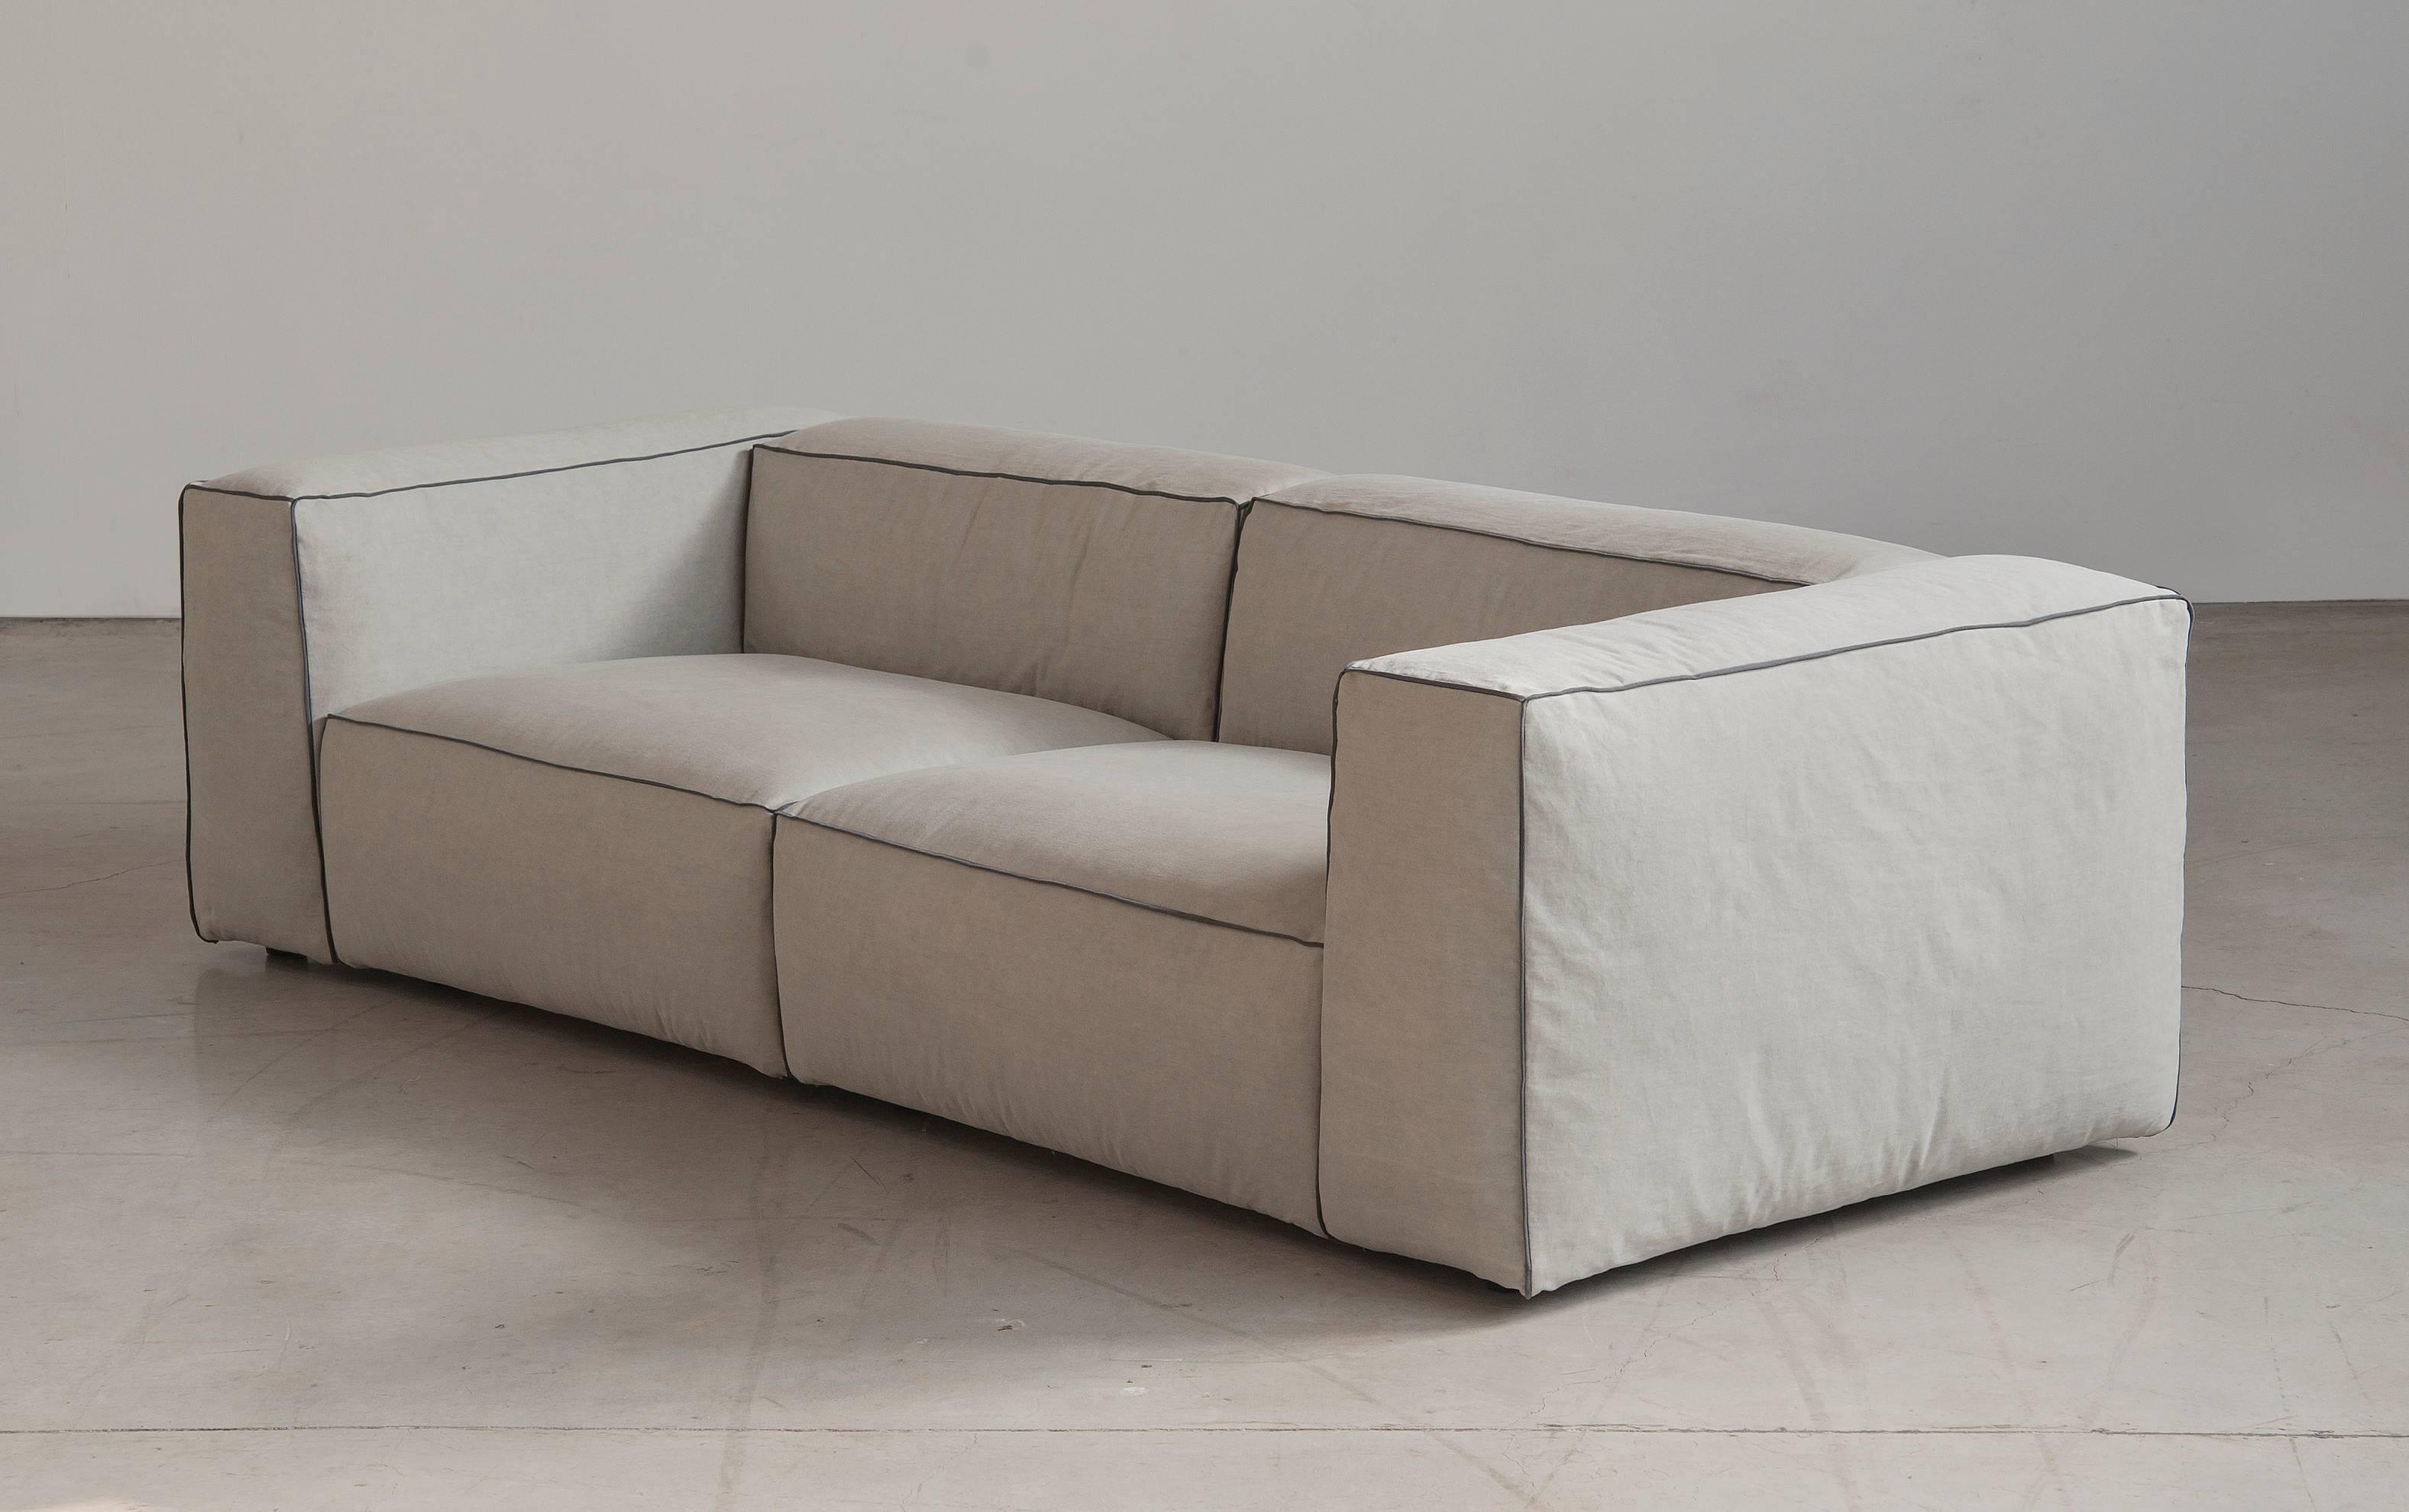 couch 250 cm simple camden corner sofa with couch 250 cm cm mega big sofa couch megasofa. Black Bedroom Furniture Sets. Home Design Ideas